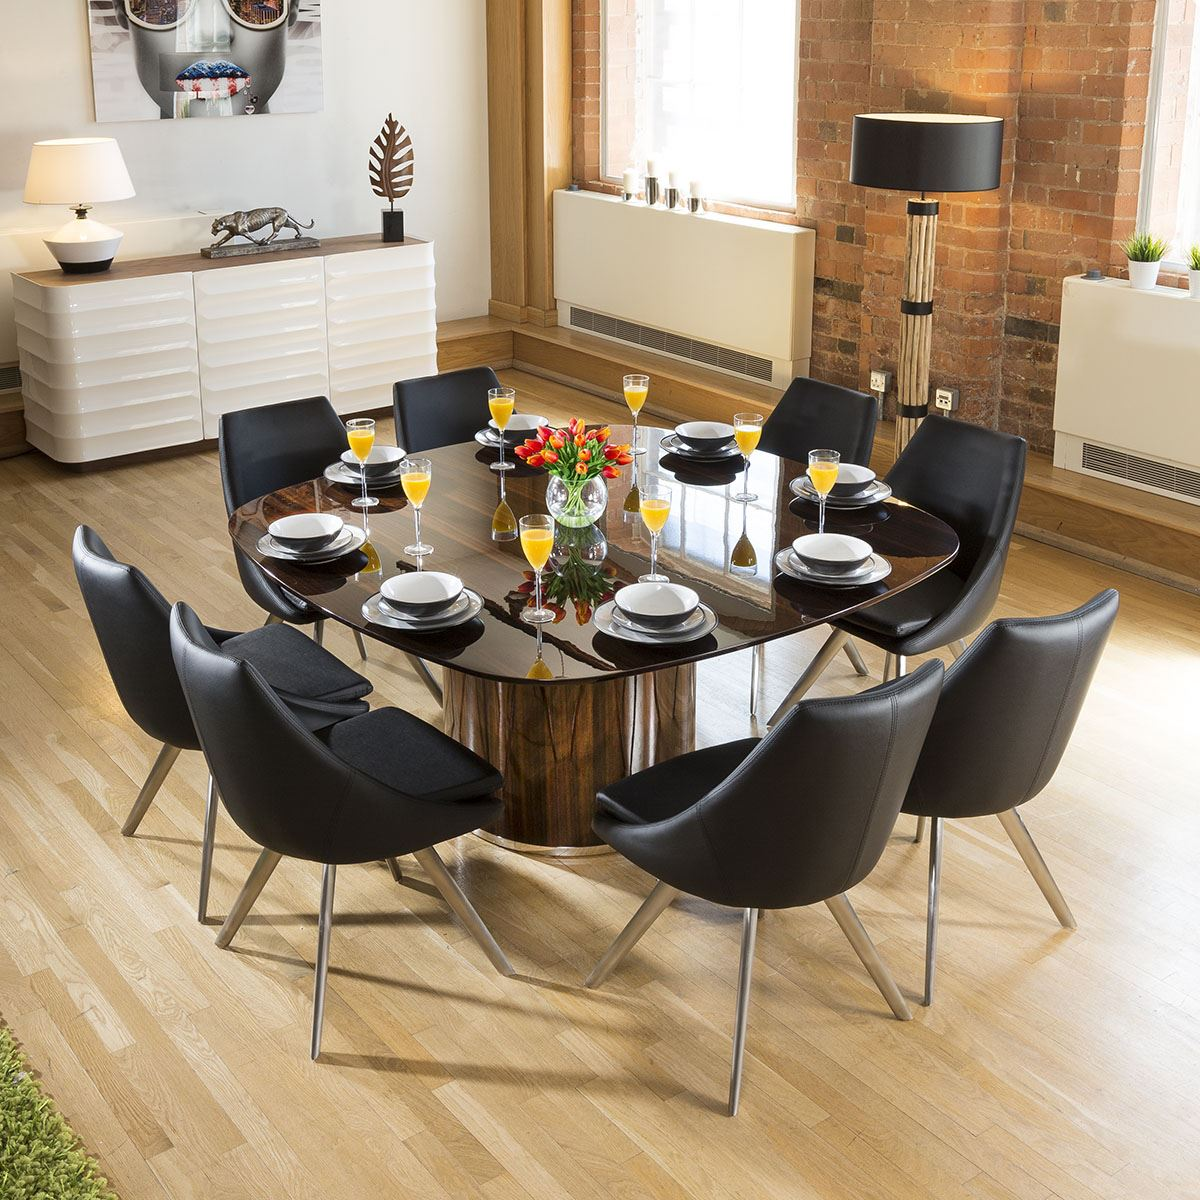 Large Luxury Square Eucalyptus Dining Table 8 Black Modern Chairs Ebay